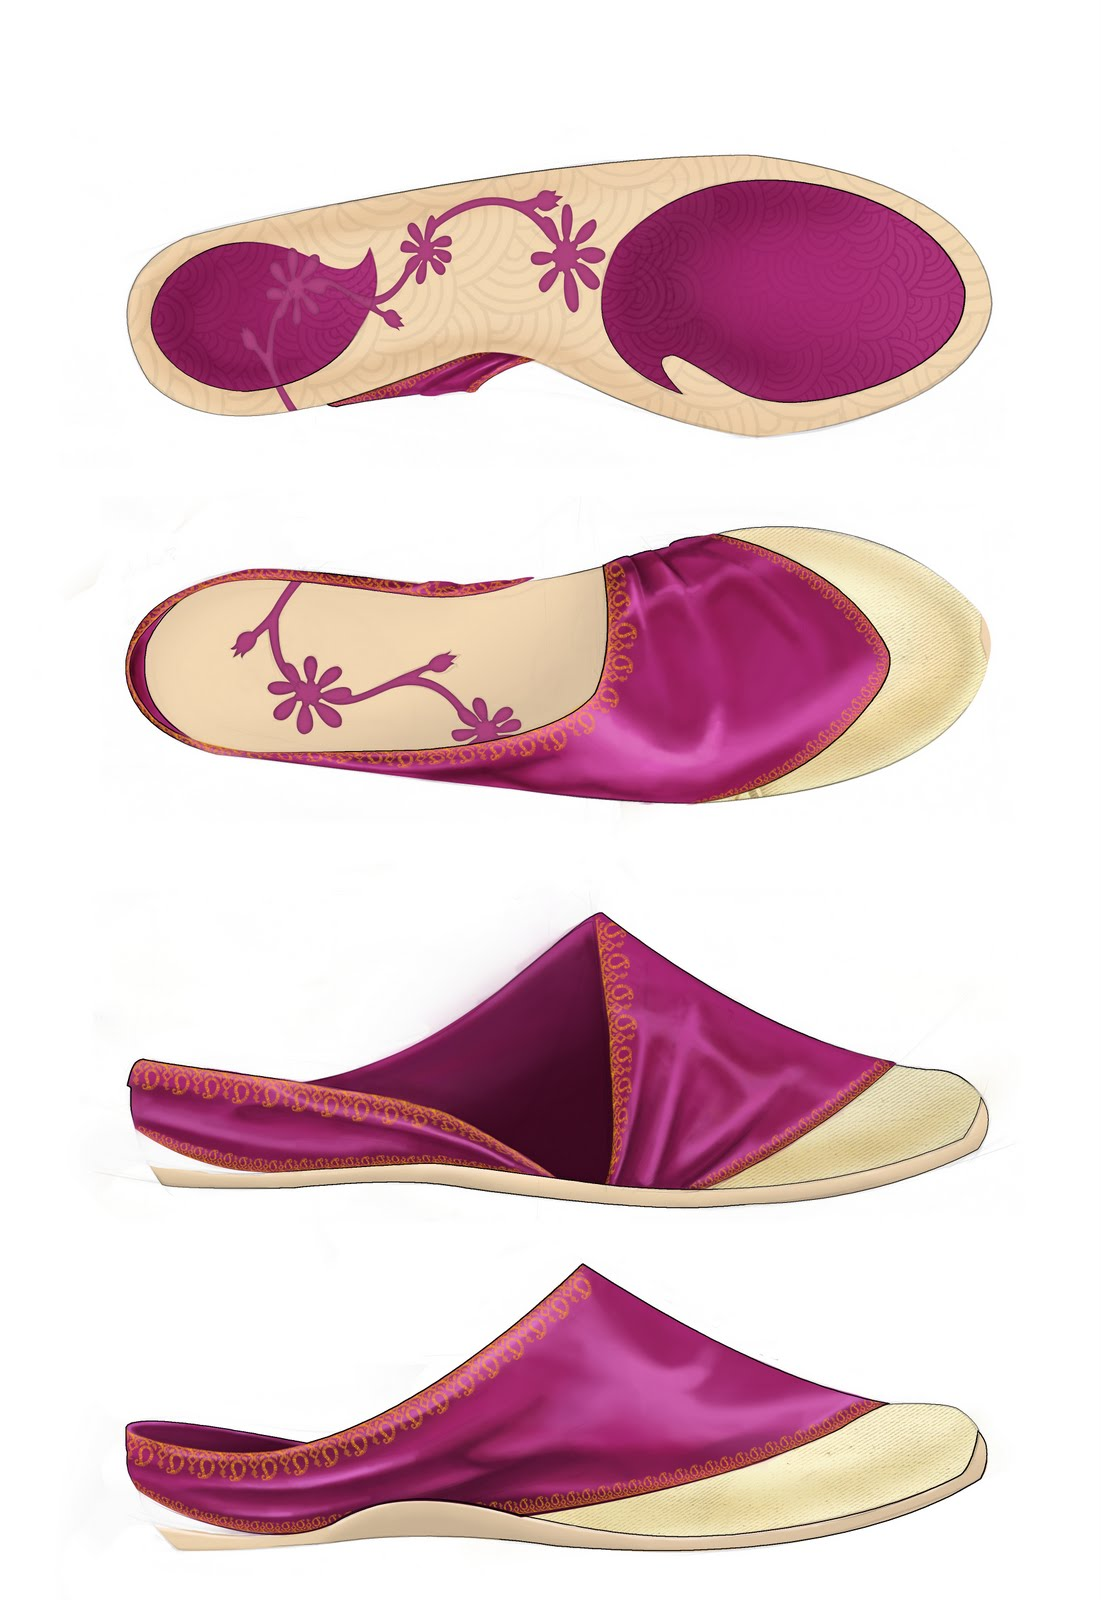 Hush puppy shoe final color scheme eba2e6a87